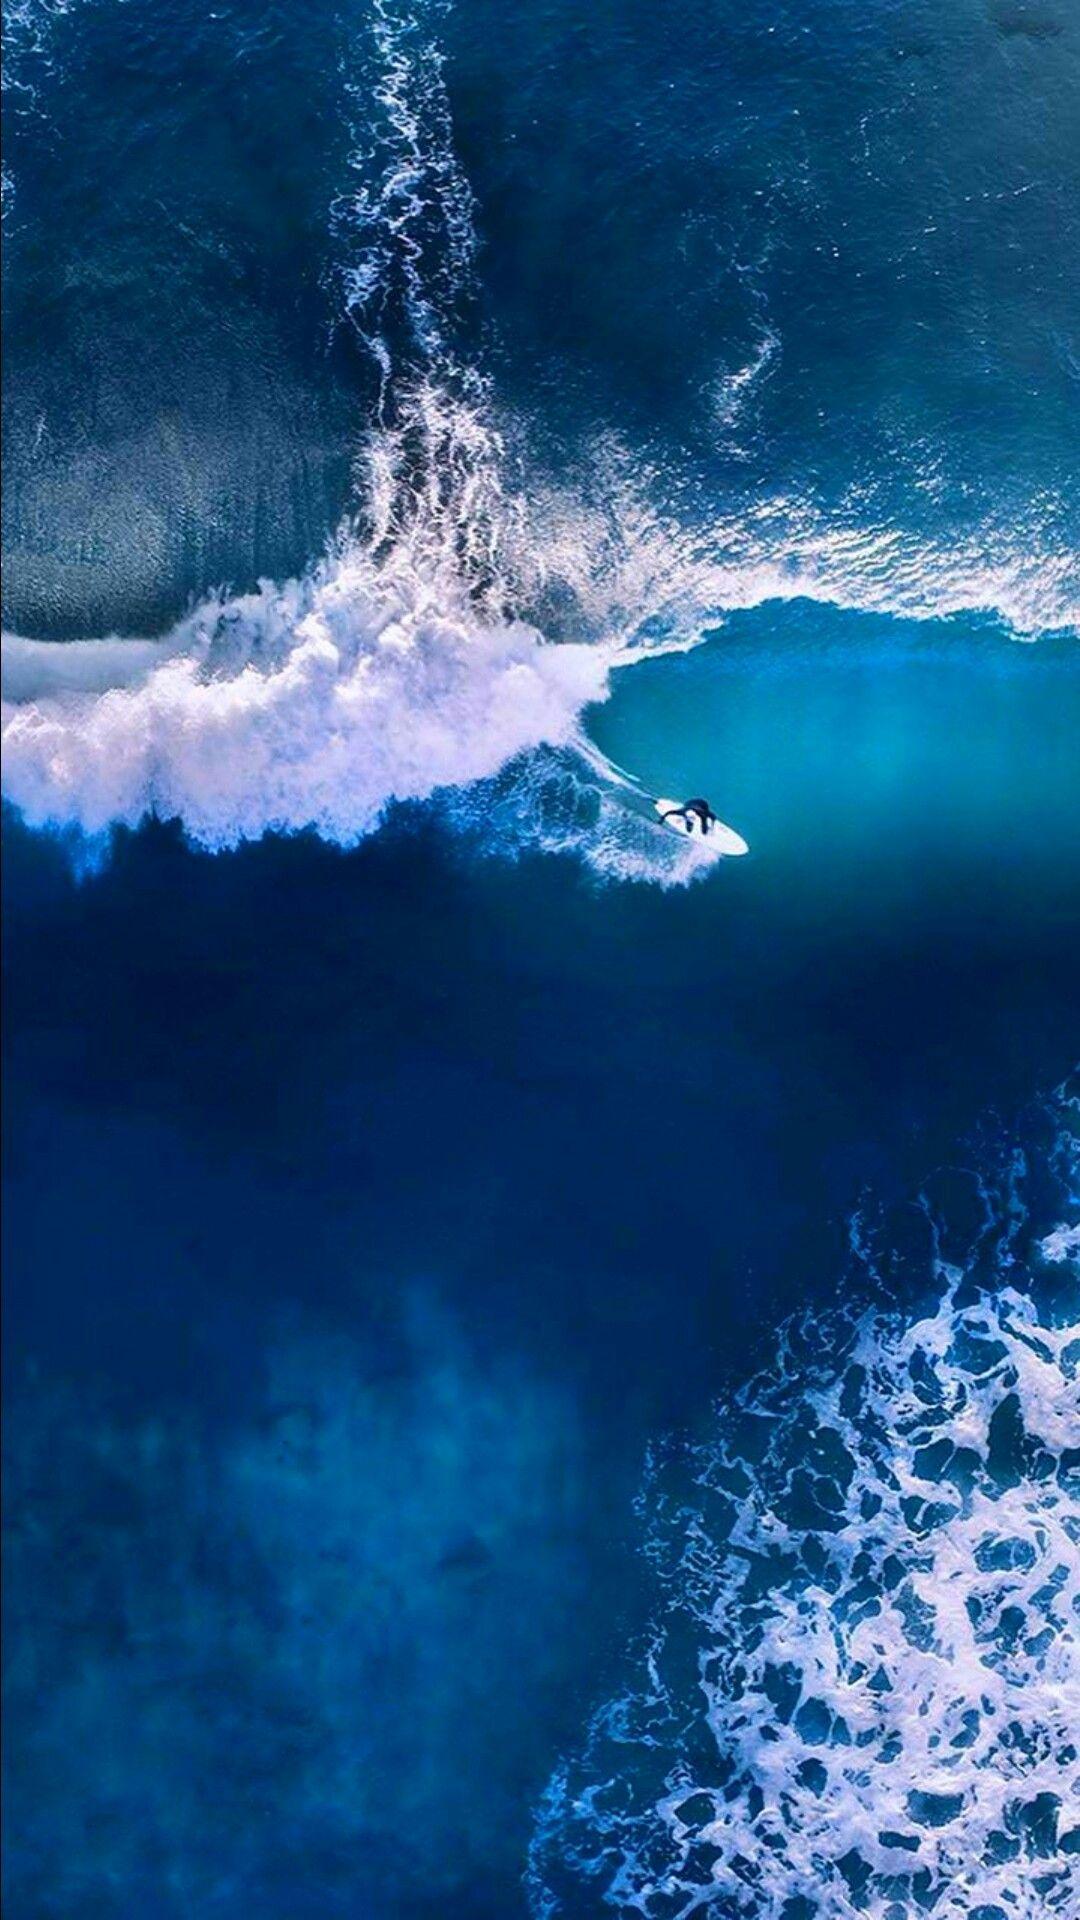 Pin On Star Corp Hd wallpaper surfer wave ocean sky